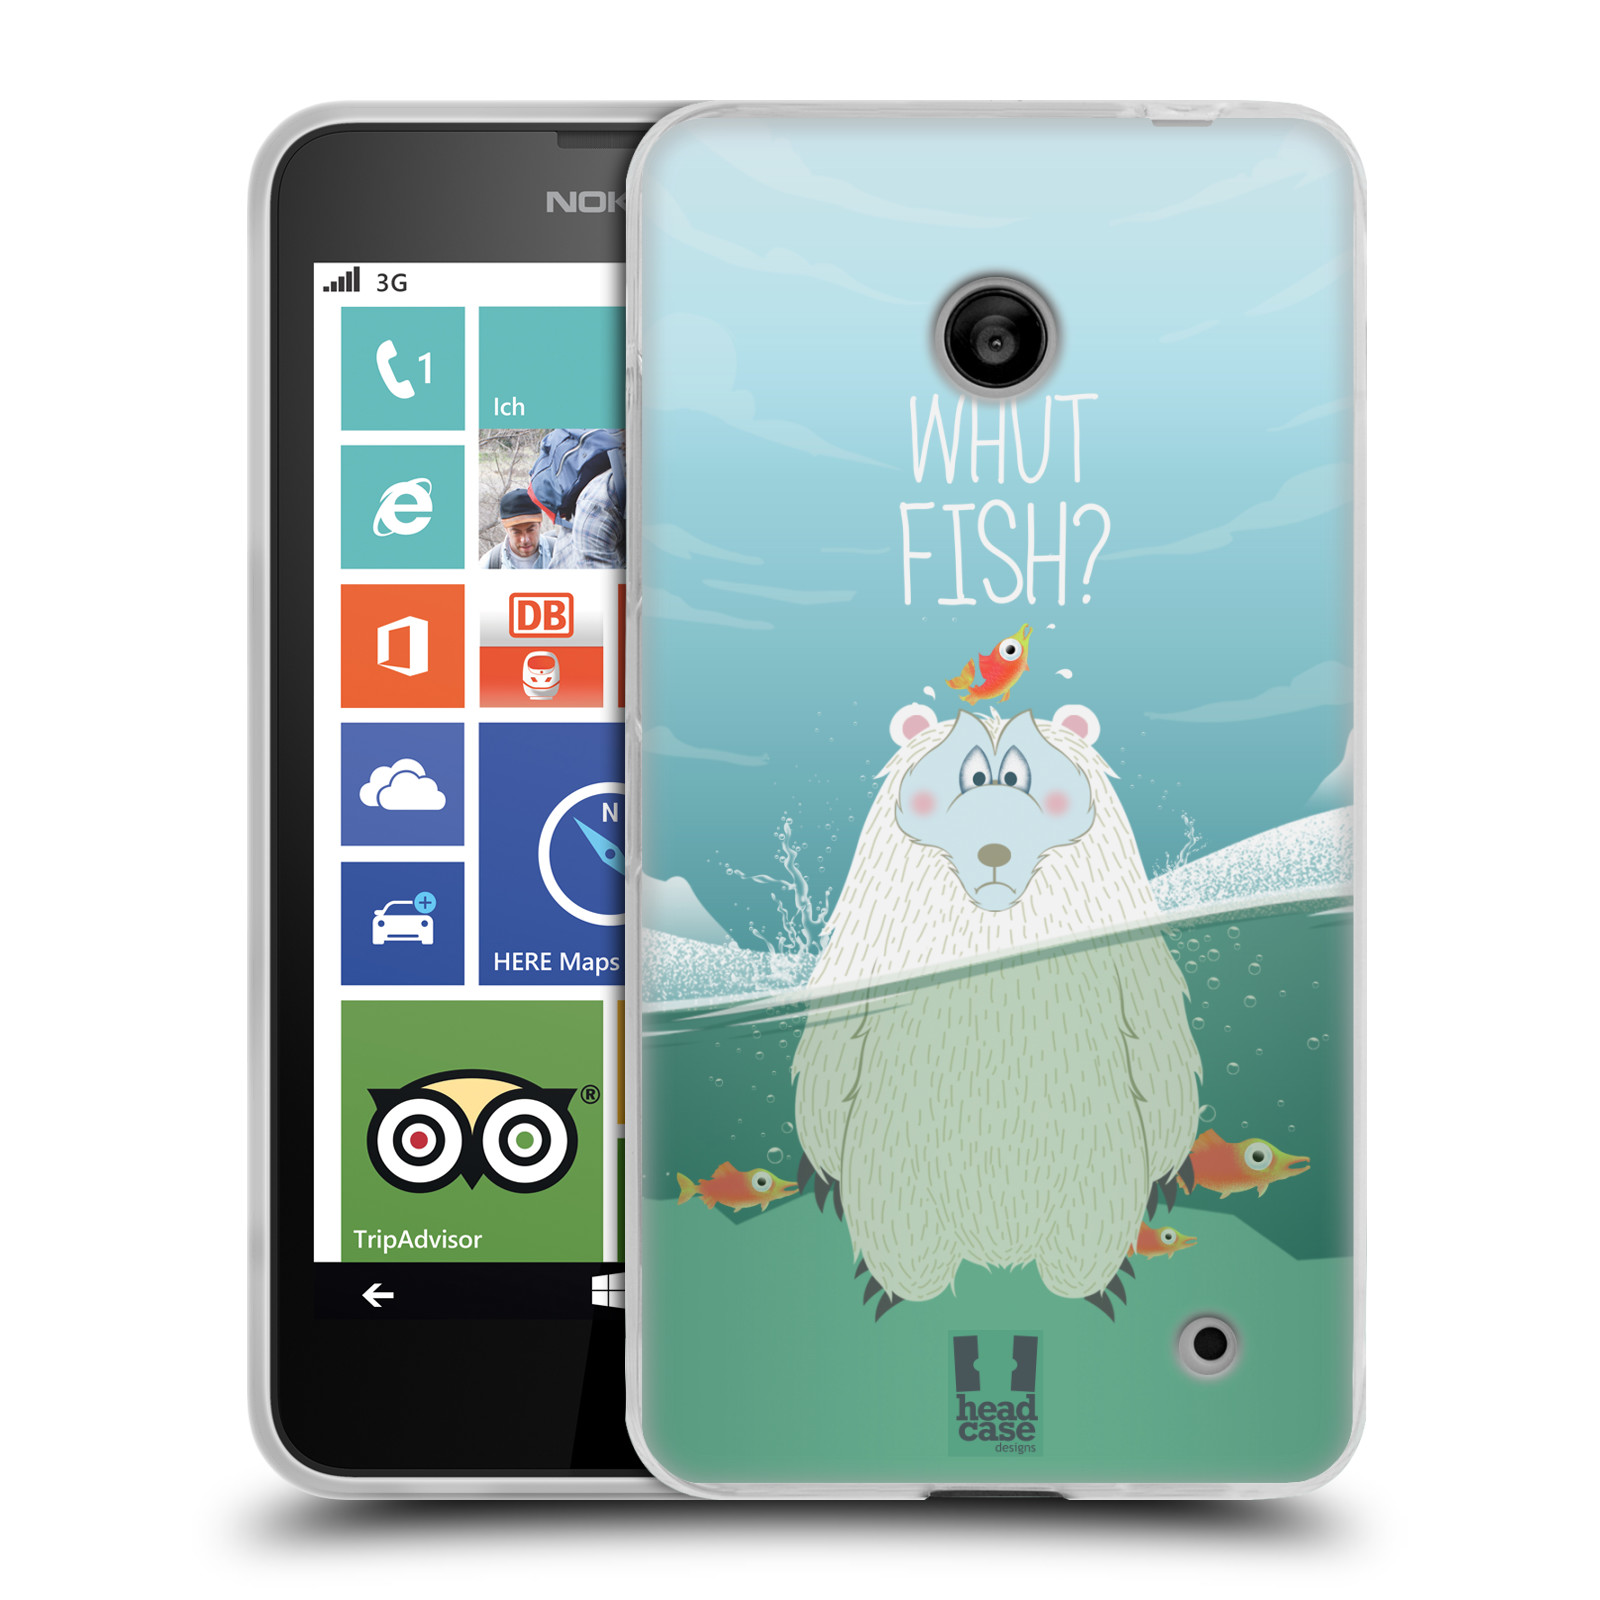 Silikonové pouzdro na mobil Nokia Lumia 635 HEAD CASE Medvěd Whut Fish? (Silikonový kryt či obal na mobilní telefon Nokia Lumia 635 Dual SIM)